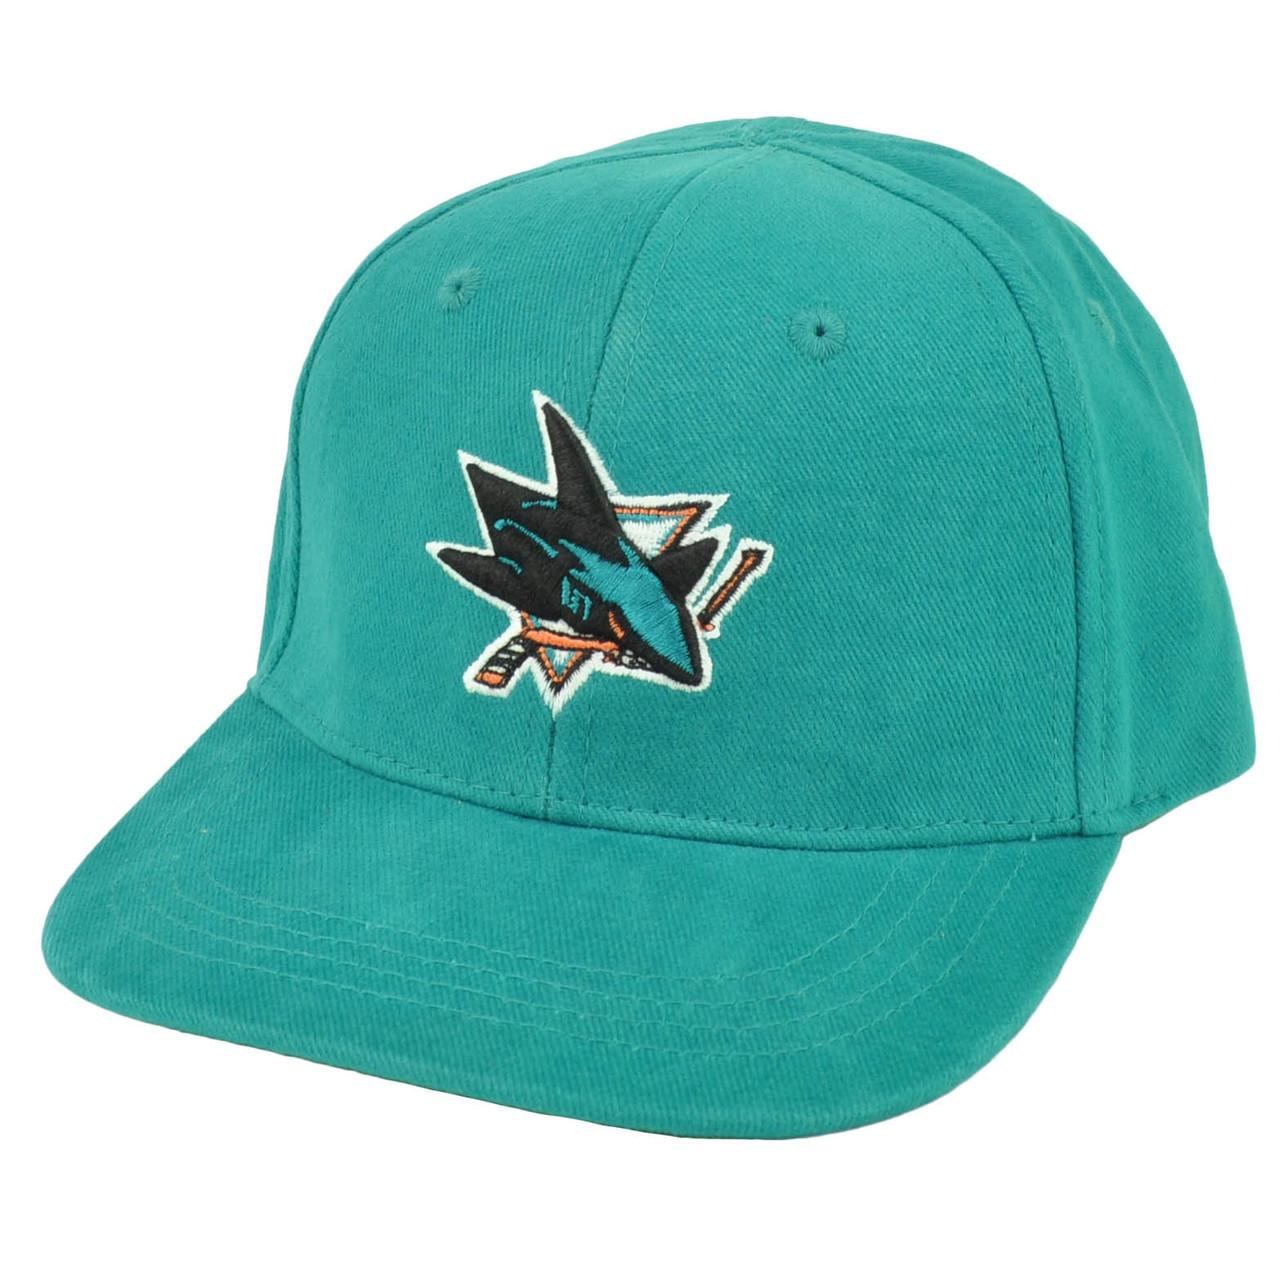 online retailer fc702 ac924 NHL San Jose Sharks Fan Favorite Infant Adjustable Hat Cap Turquoise Robbie